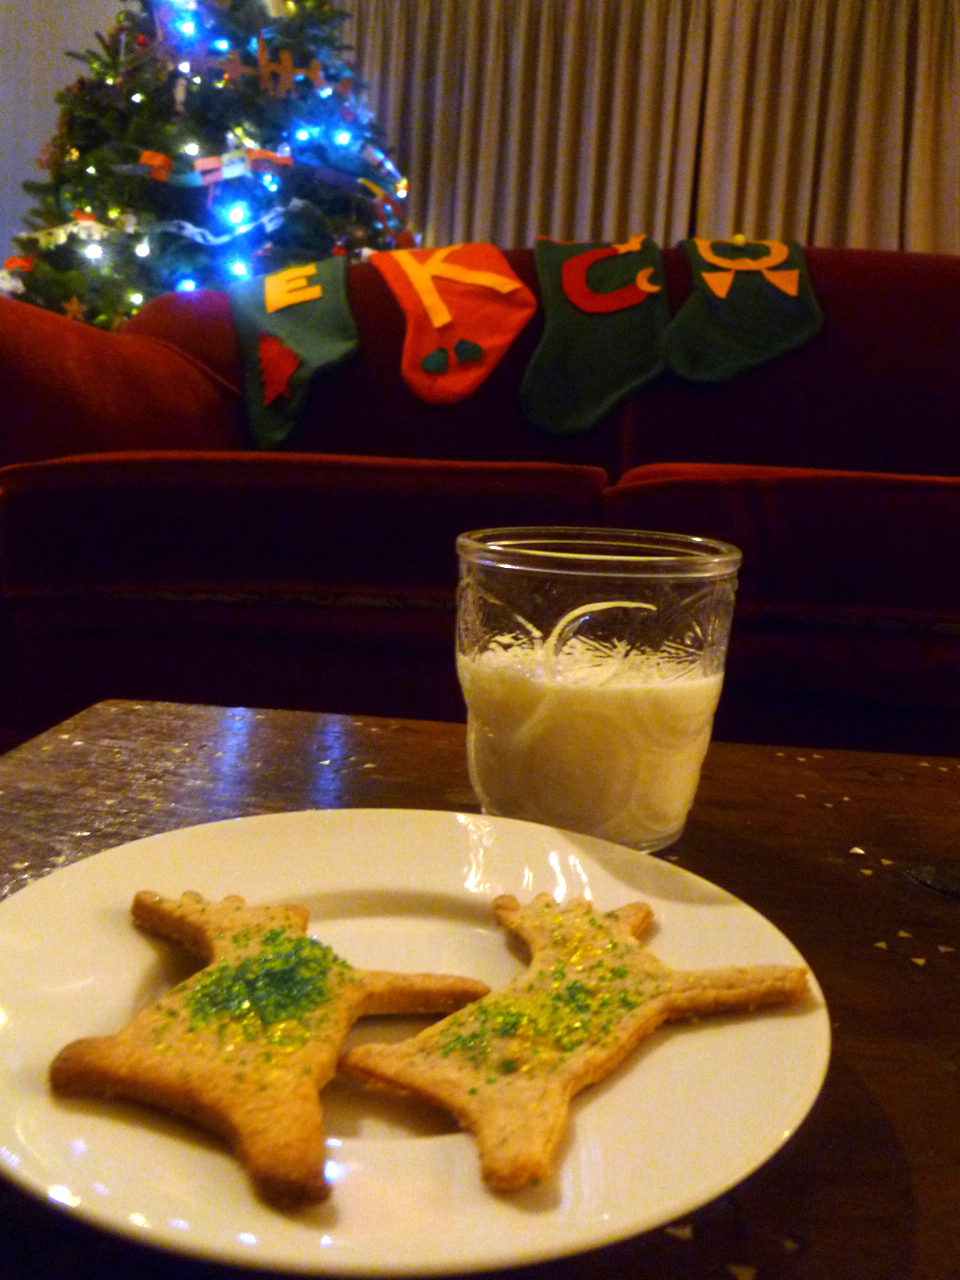 Fairmount Neighborhood Farmers Market: Swedish Rye Cookies